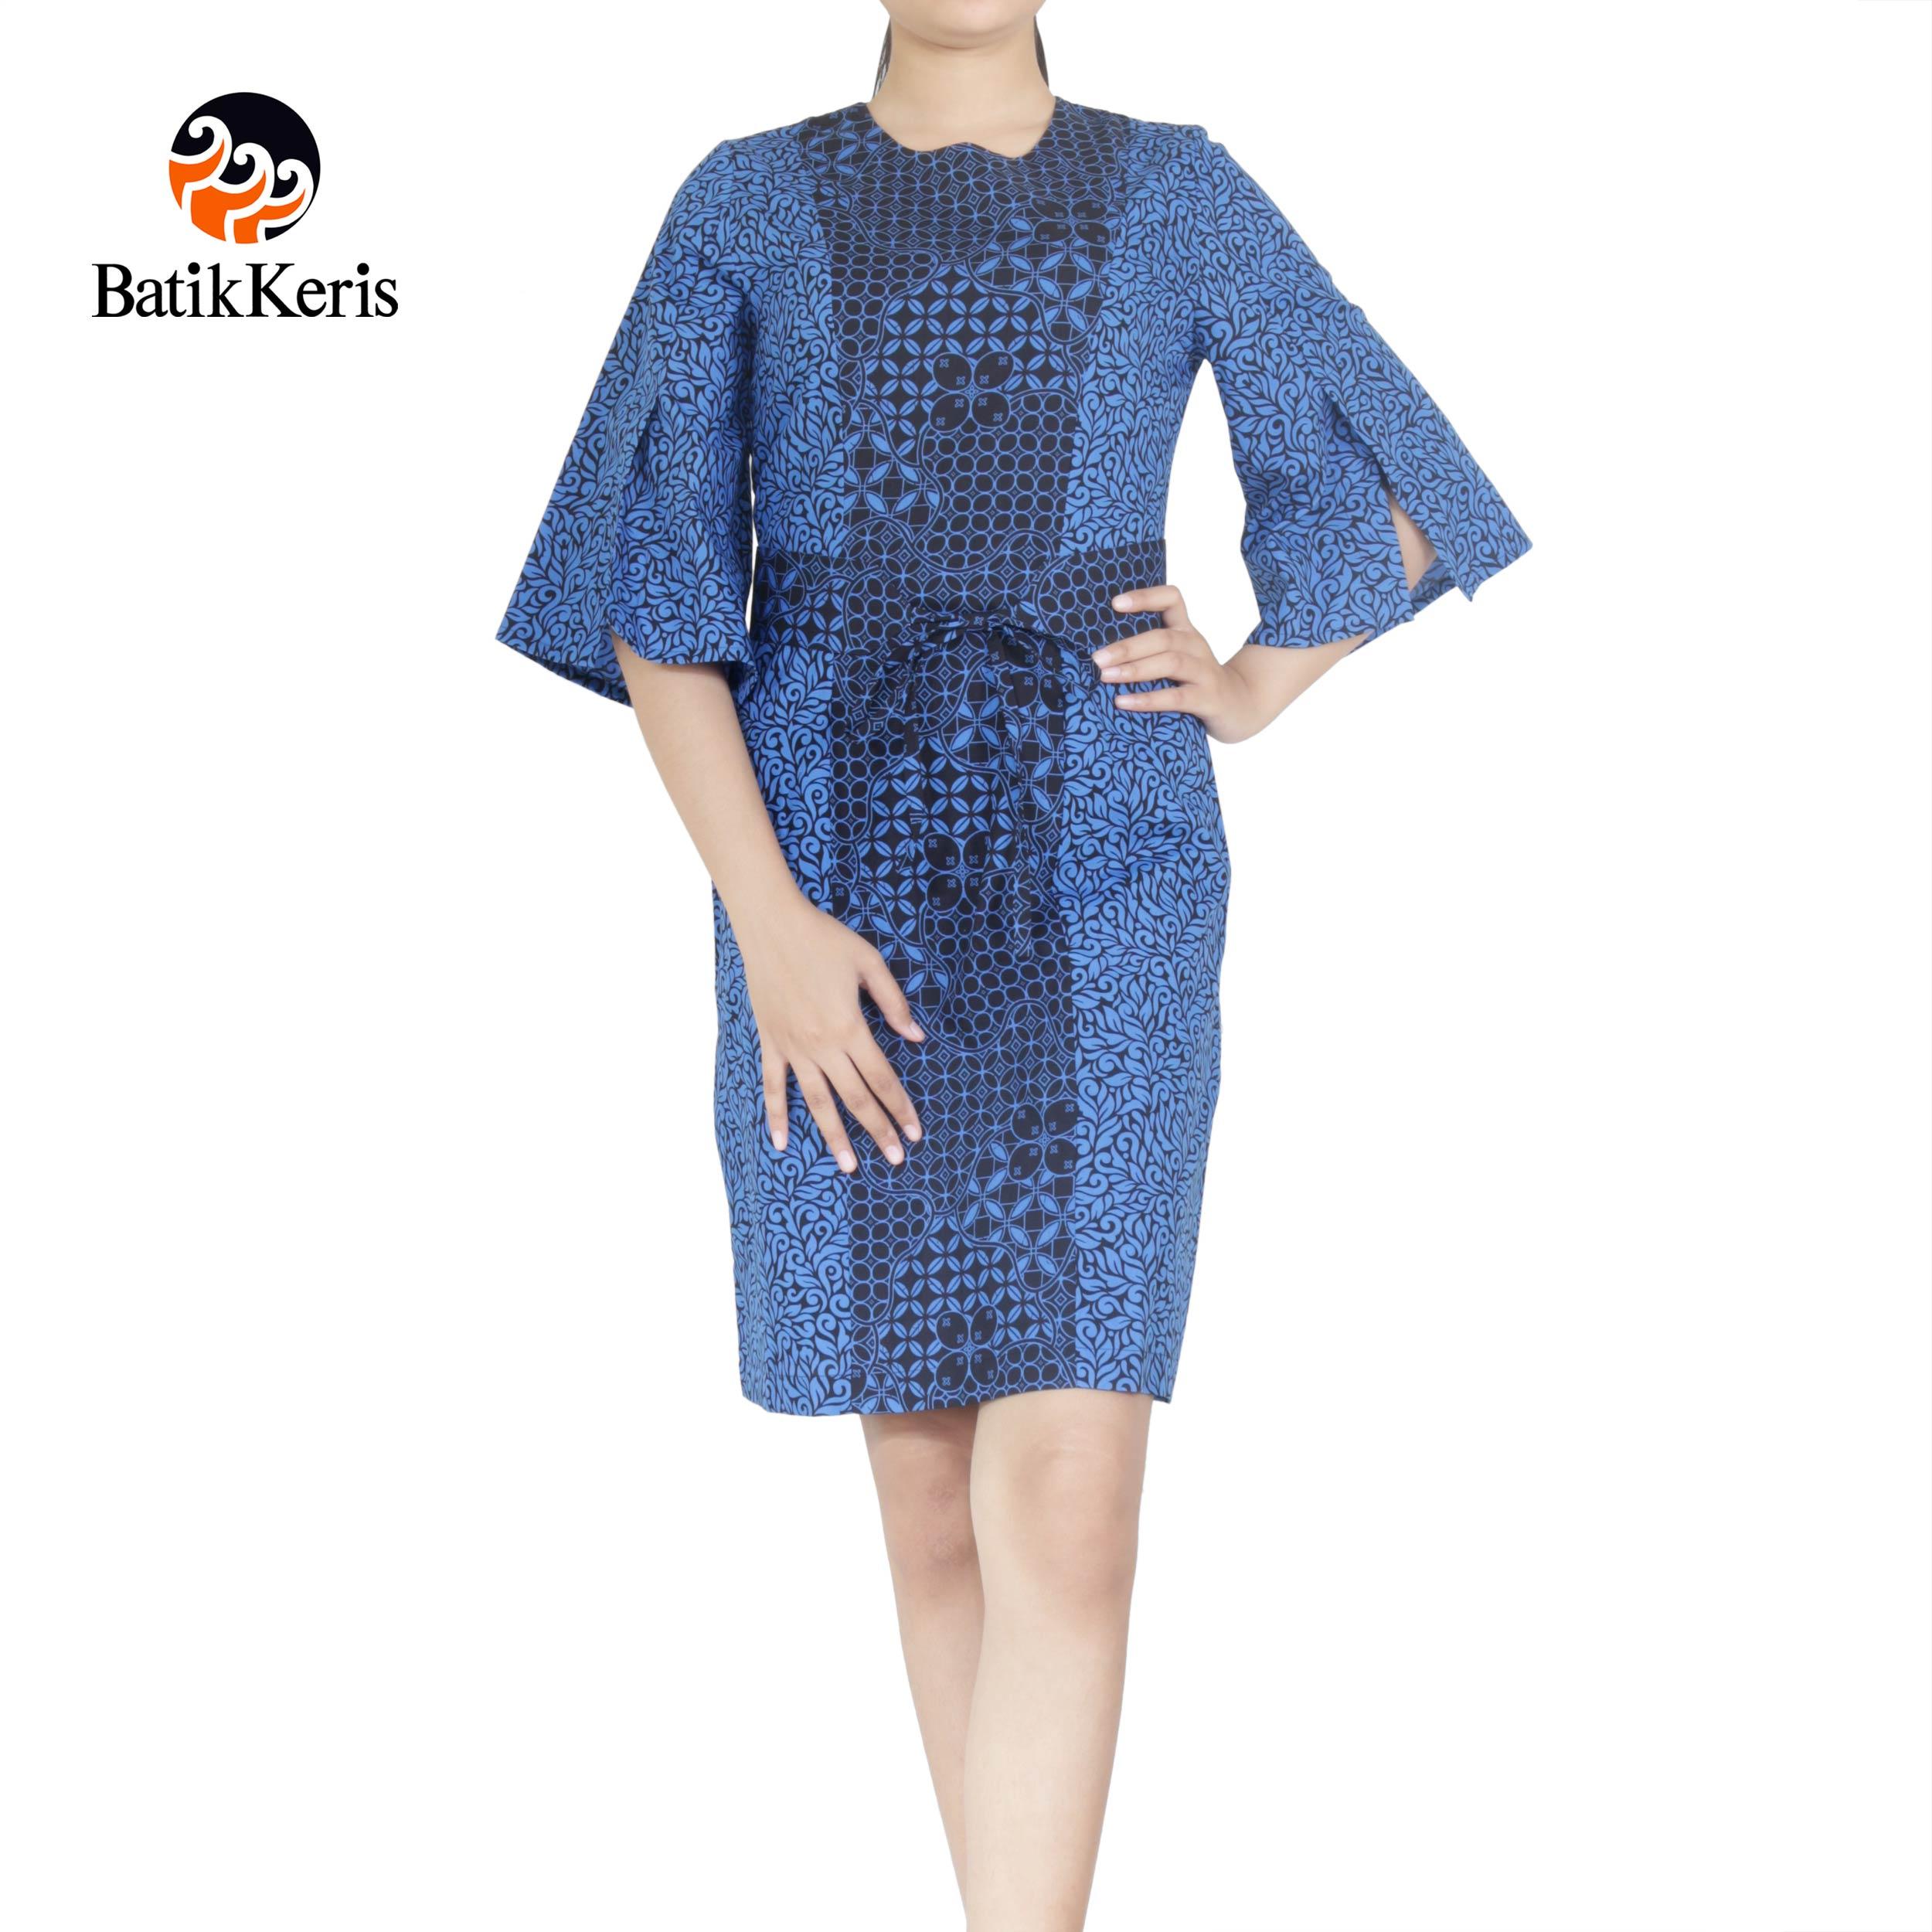 Batik Keris Online » SACKDRESS BATIK MOTIF KAWUNG WIWARNO KOMBINASI ... 8ce96e5225